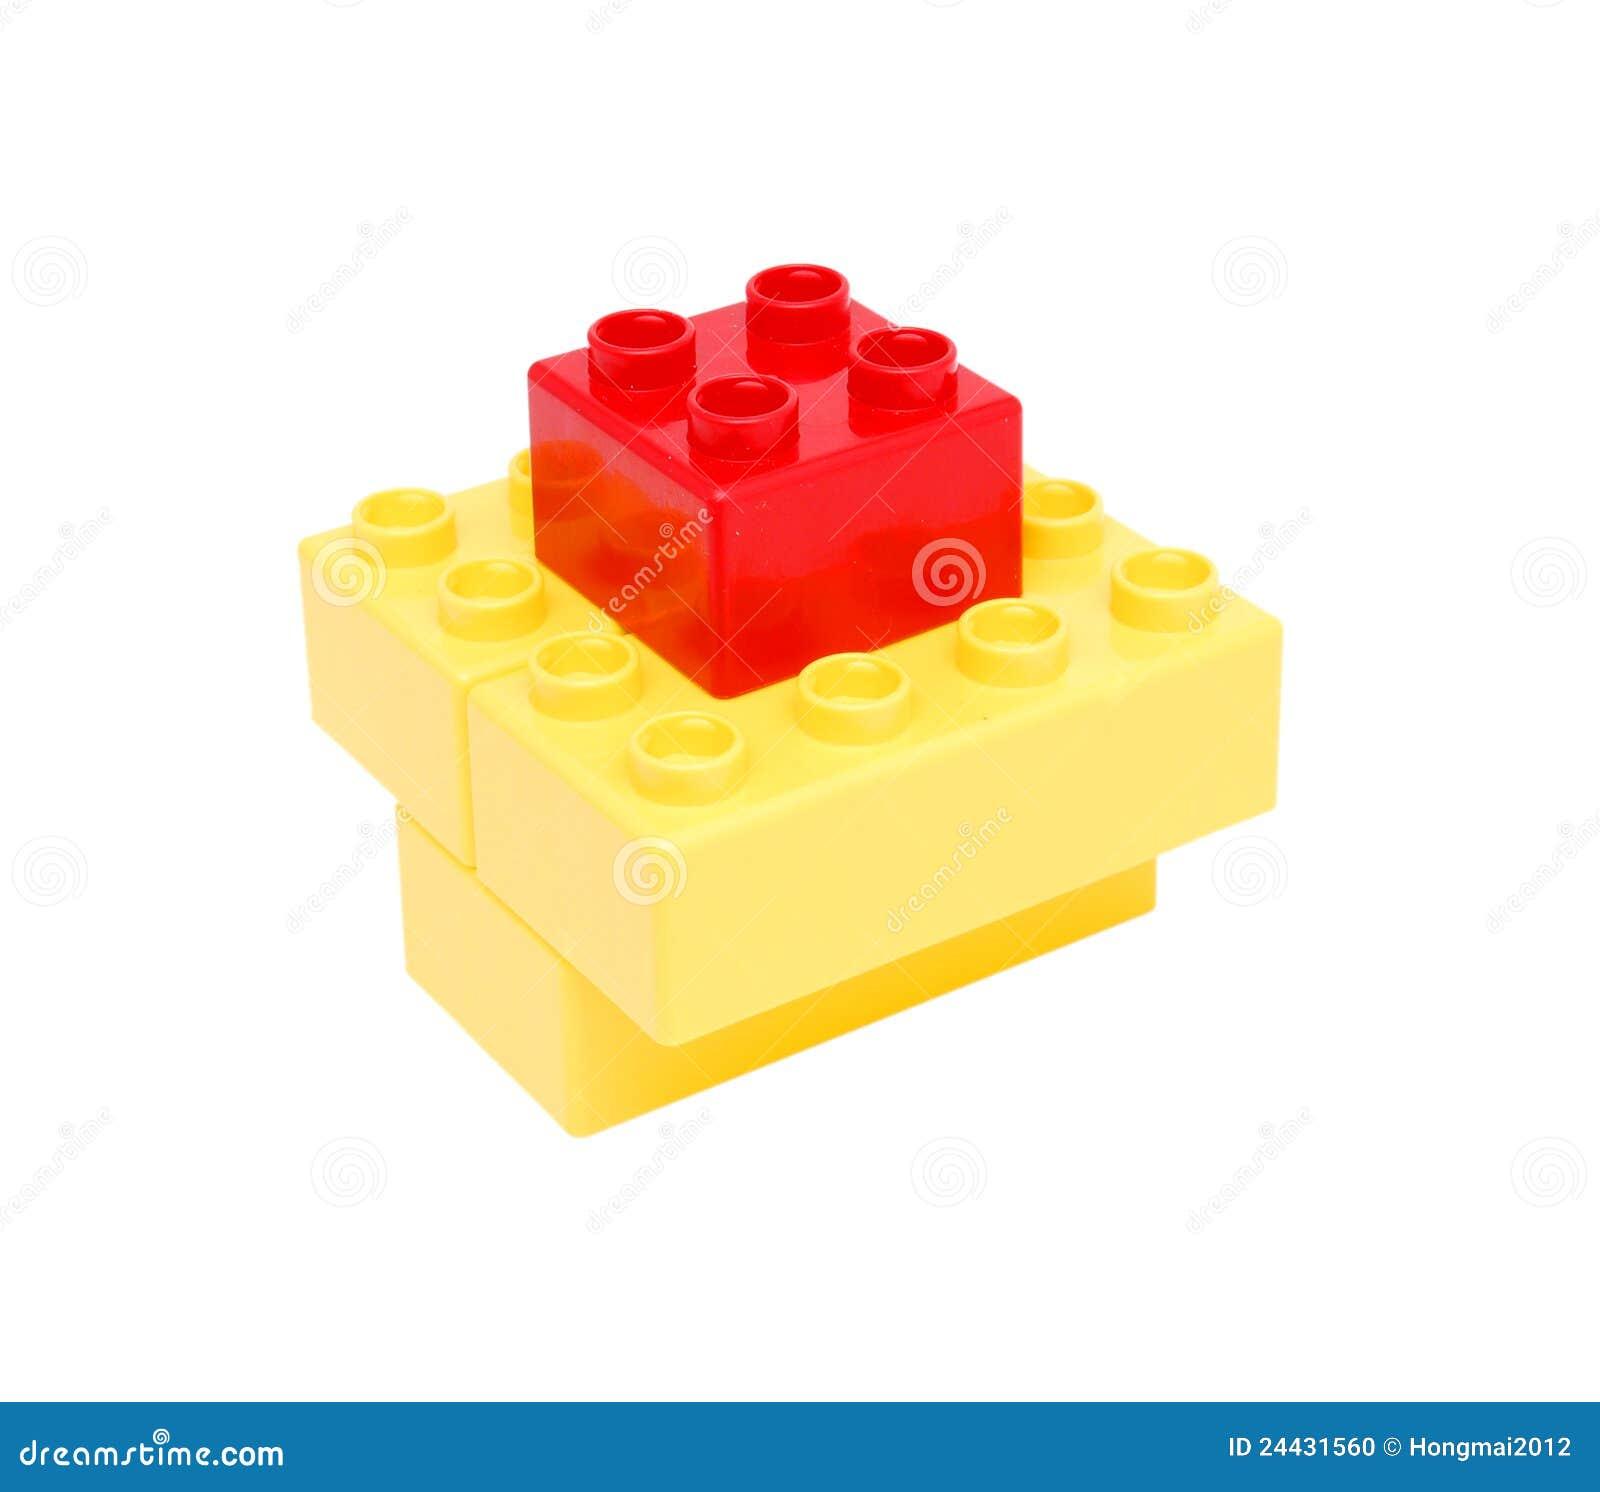 Plastic Building Blocks Stock Photo Image 24431560